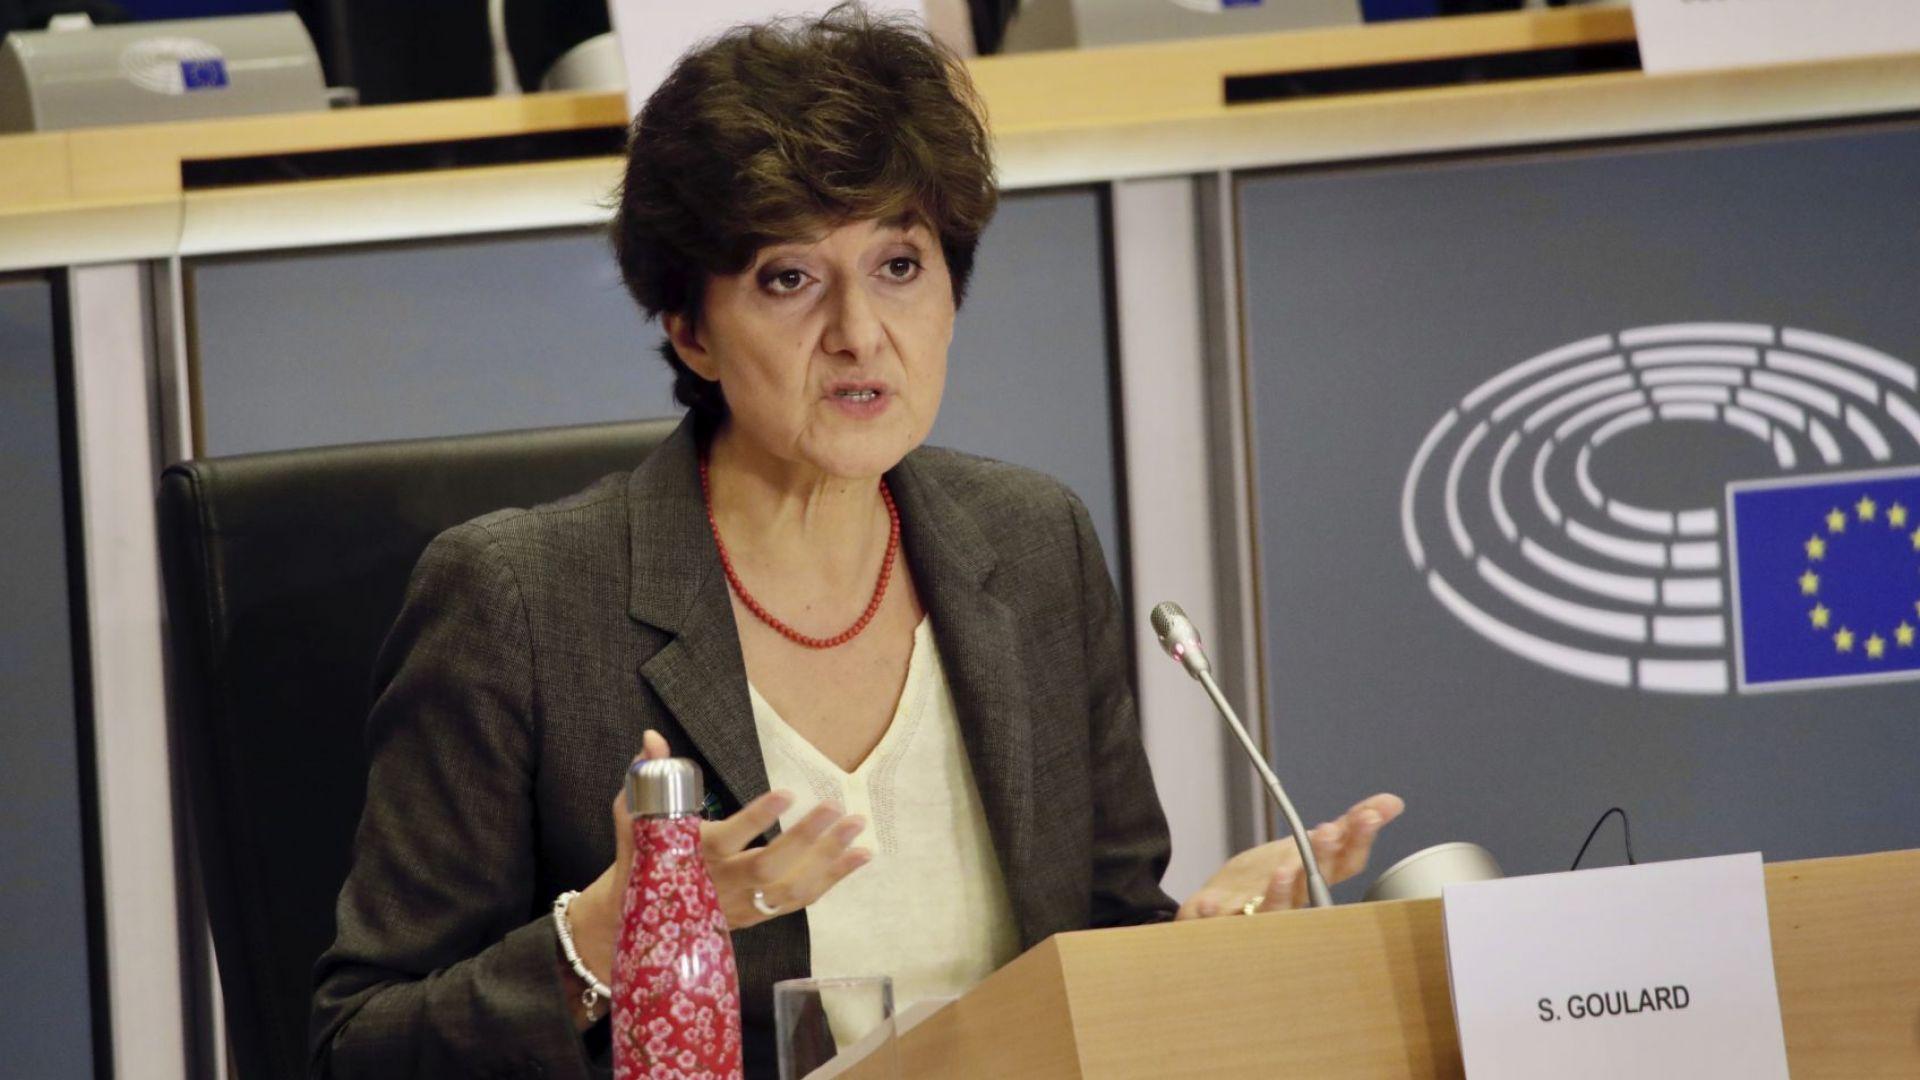 Евродепутатите гласуваха днес категорично против кандидатурата на Силви Гулар за